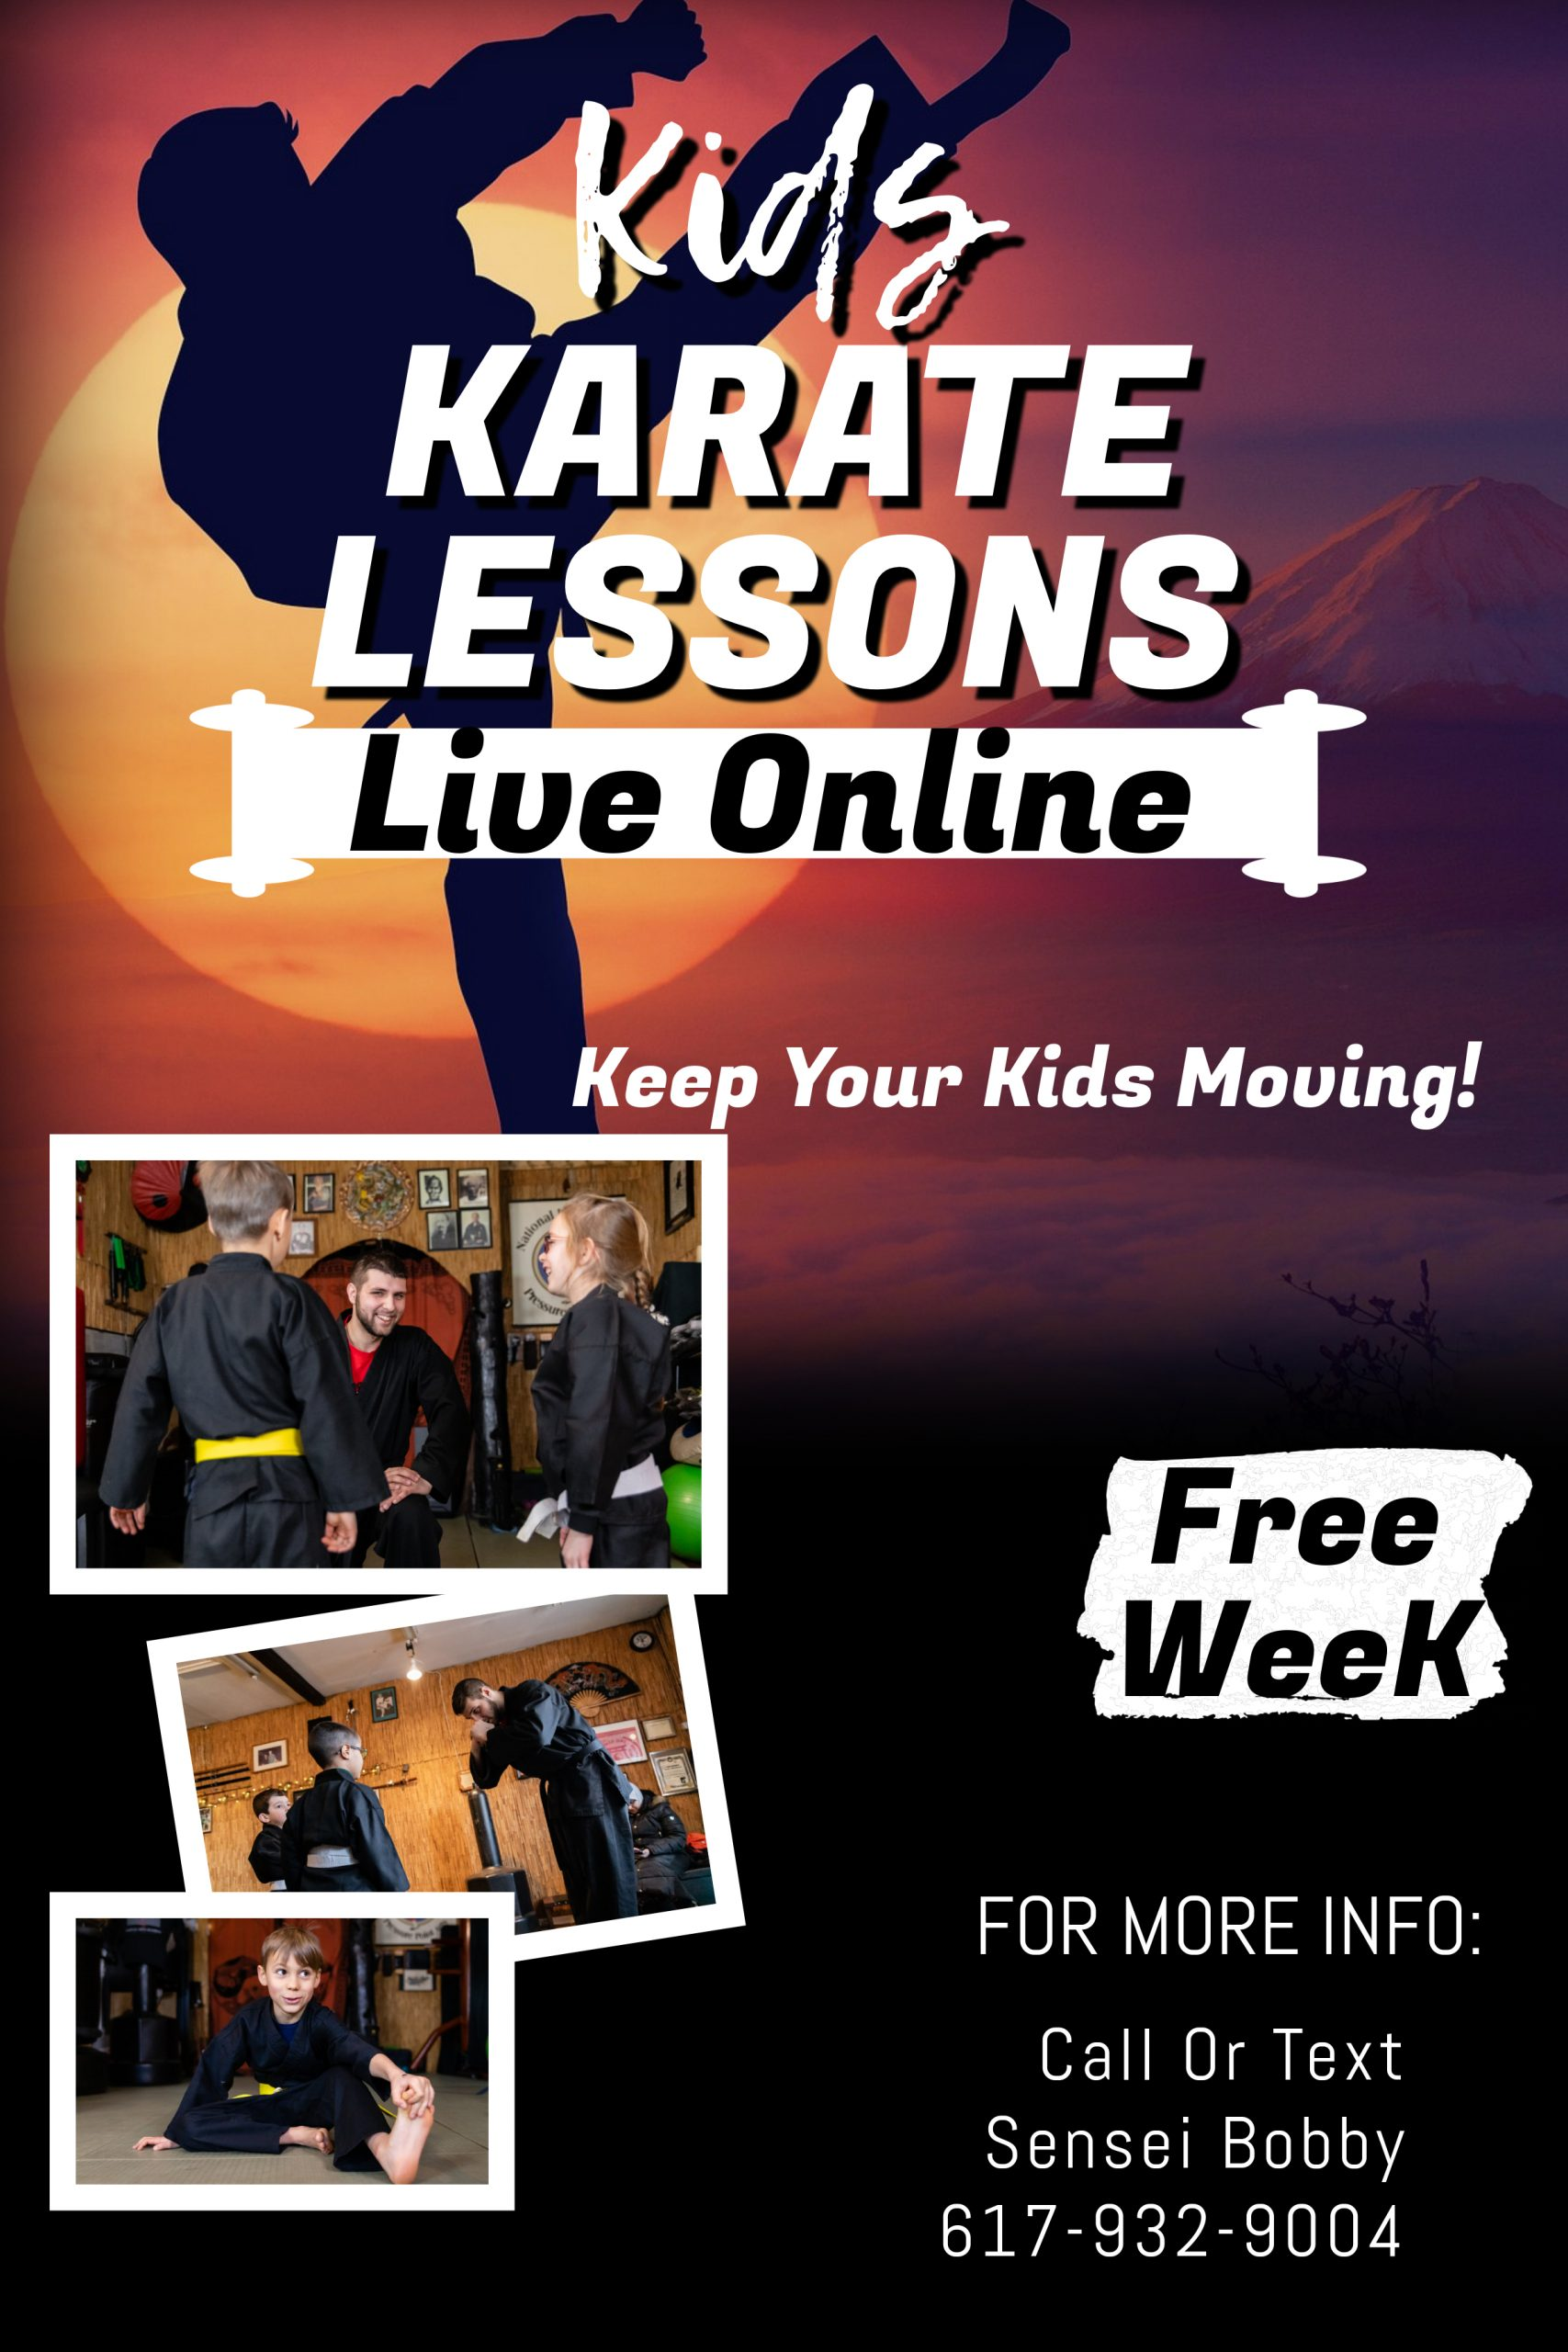 Kids Online Karate classes